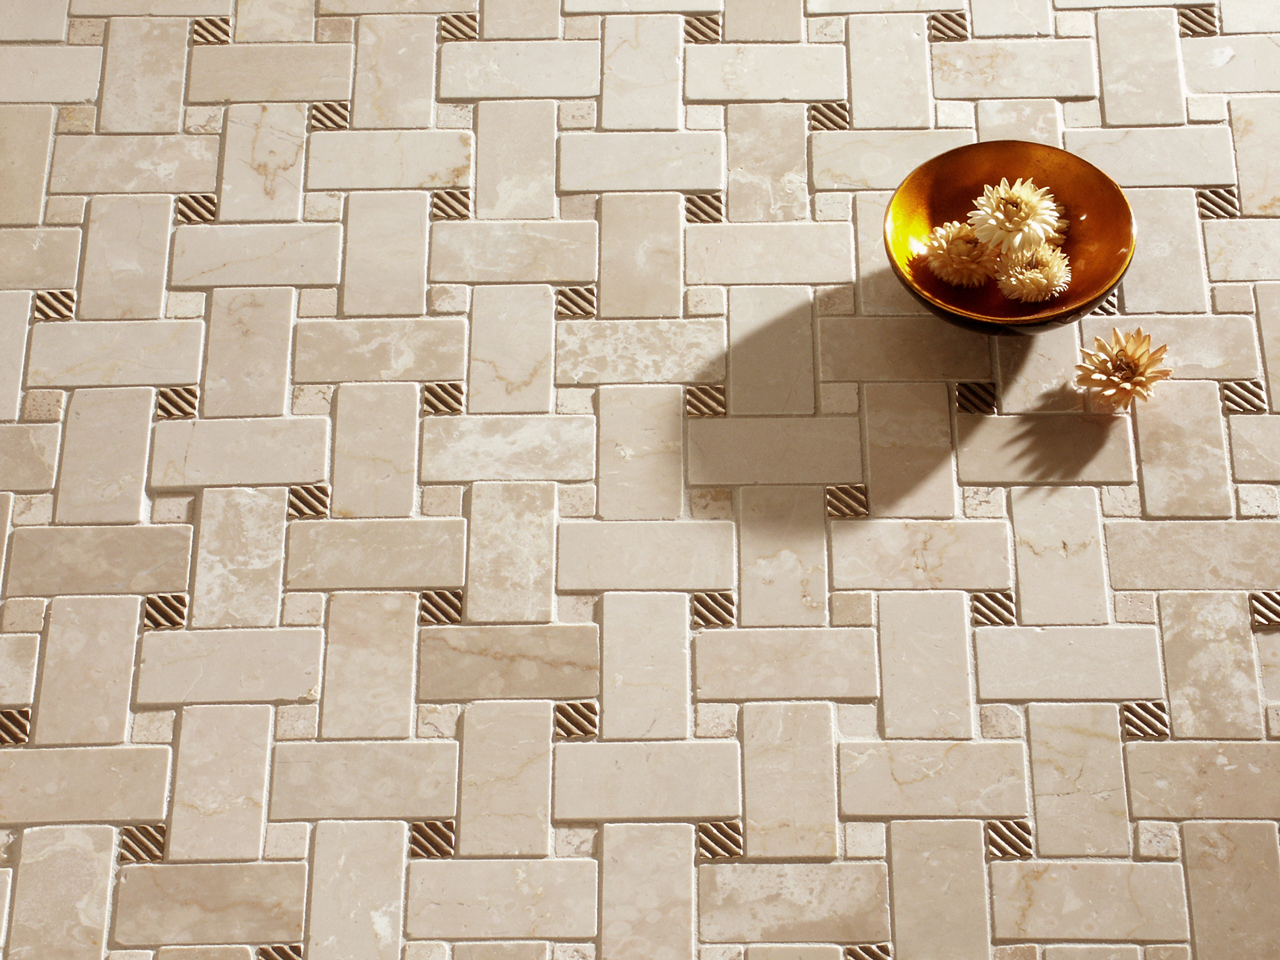 Mosaic Tile Accent Wall - Ivoiregion